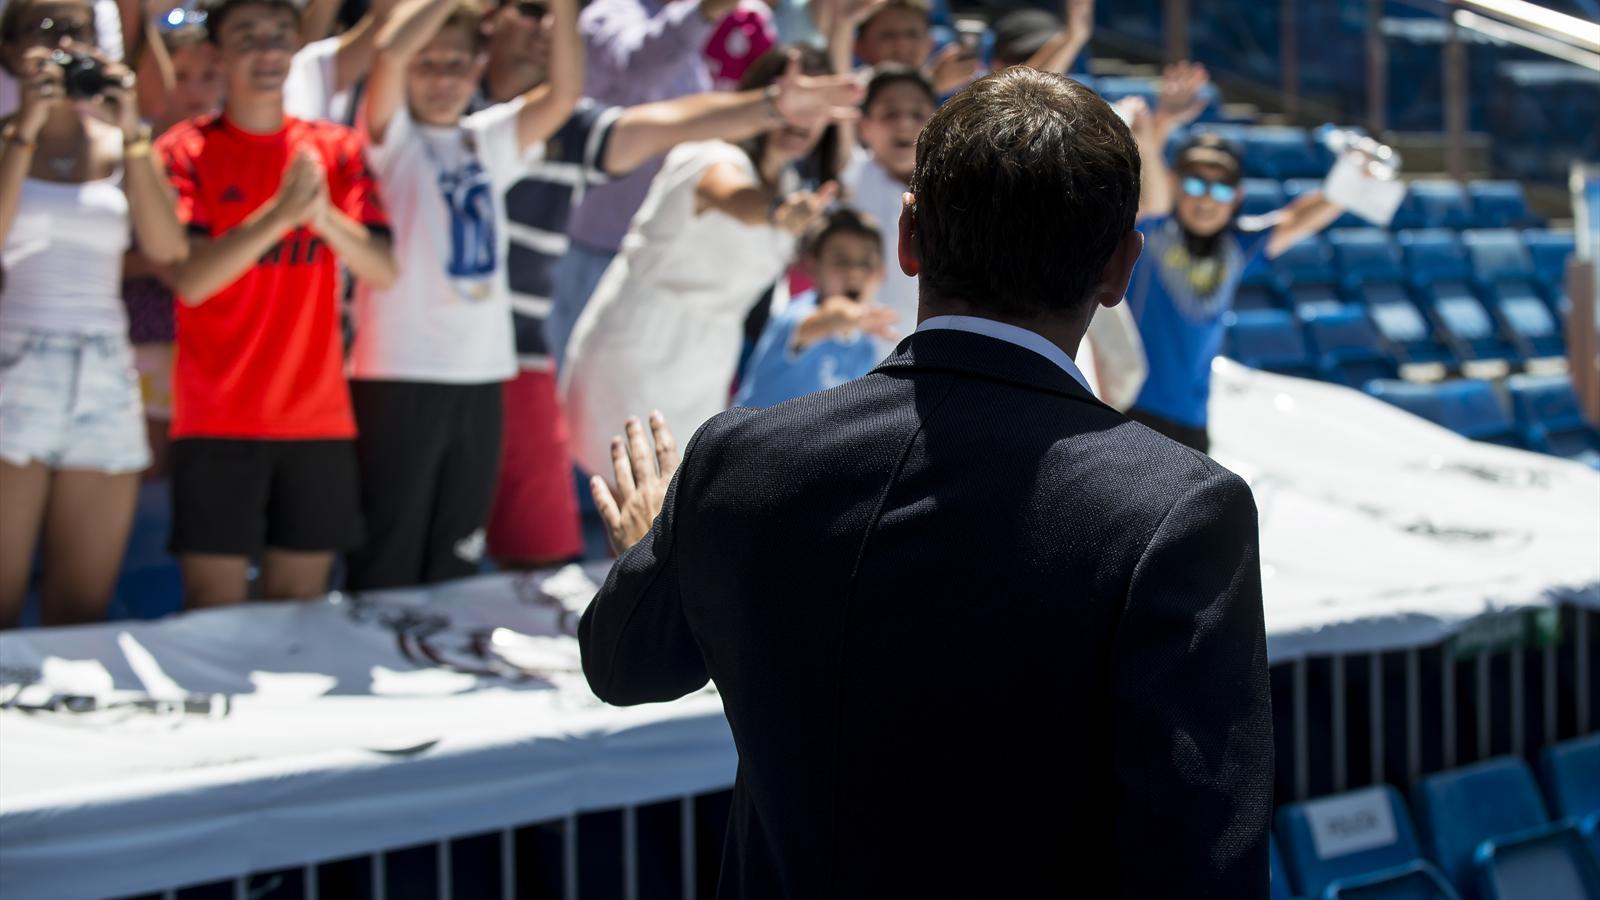 Iker Casillas (Real Madrid) lors de son départ du Real Madrid